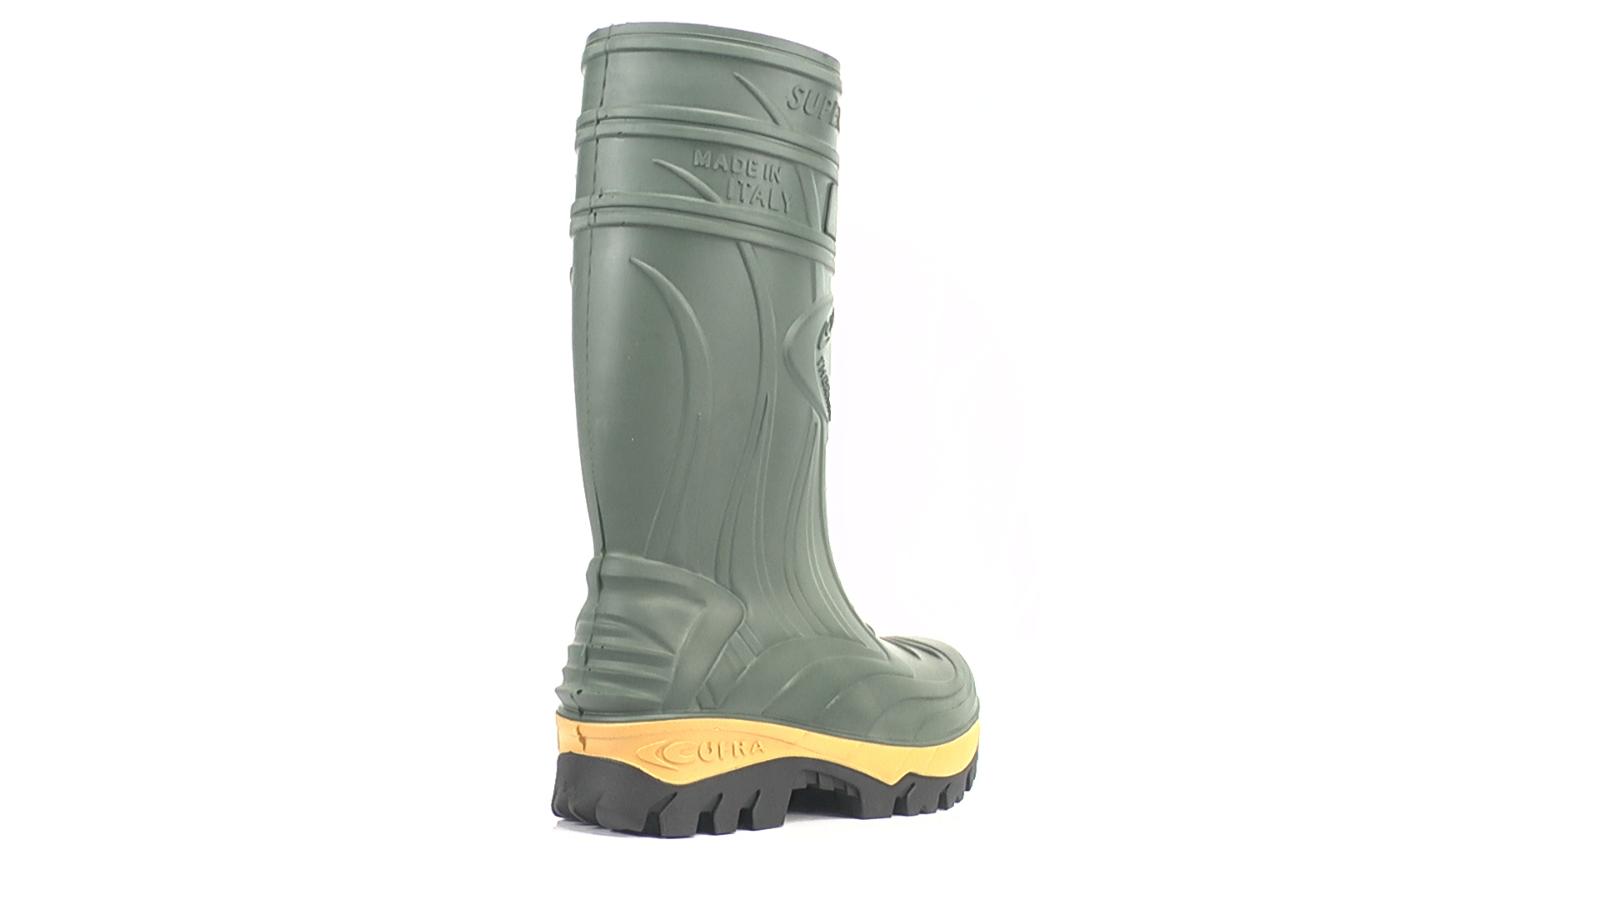 Cofra Safest S5 Safety Green Wellingtons Composite Toe Cap Midsole Metal Free